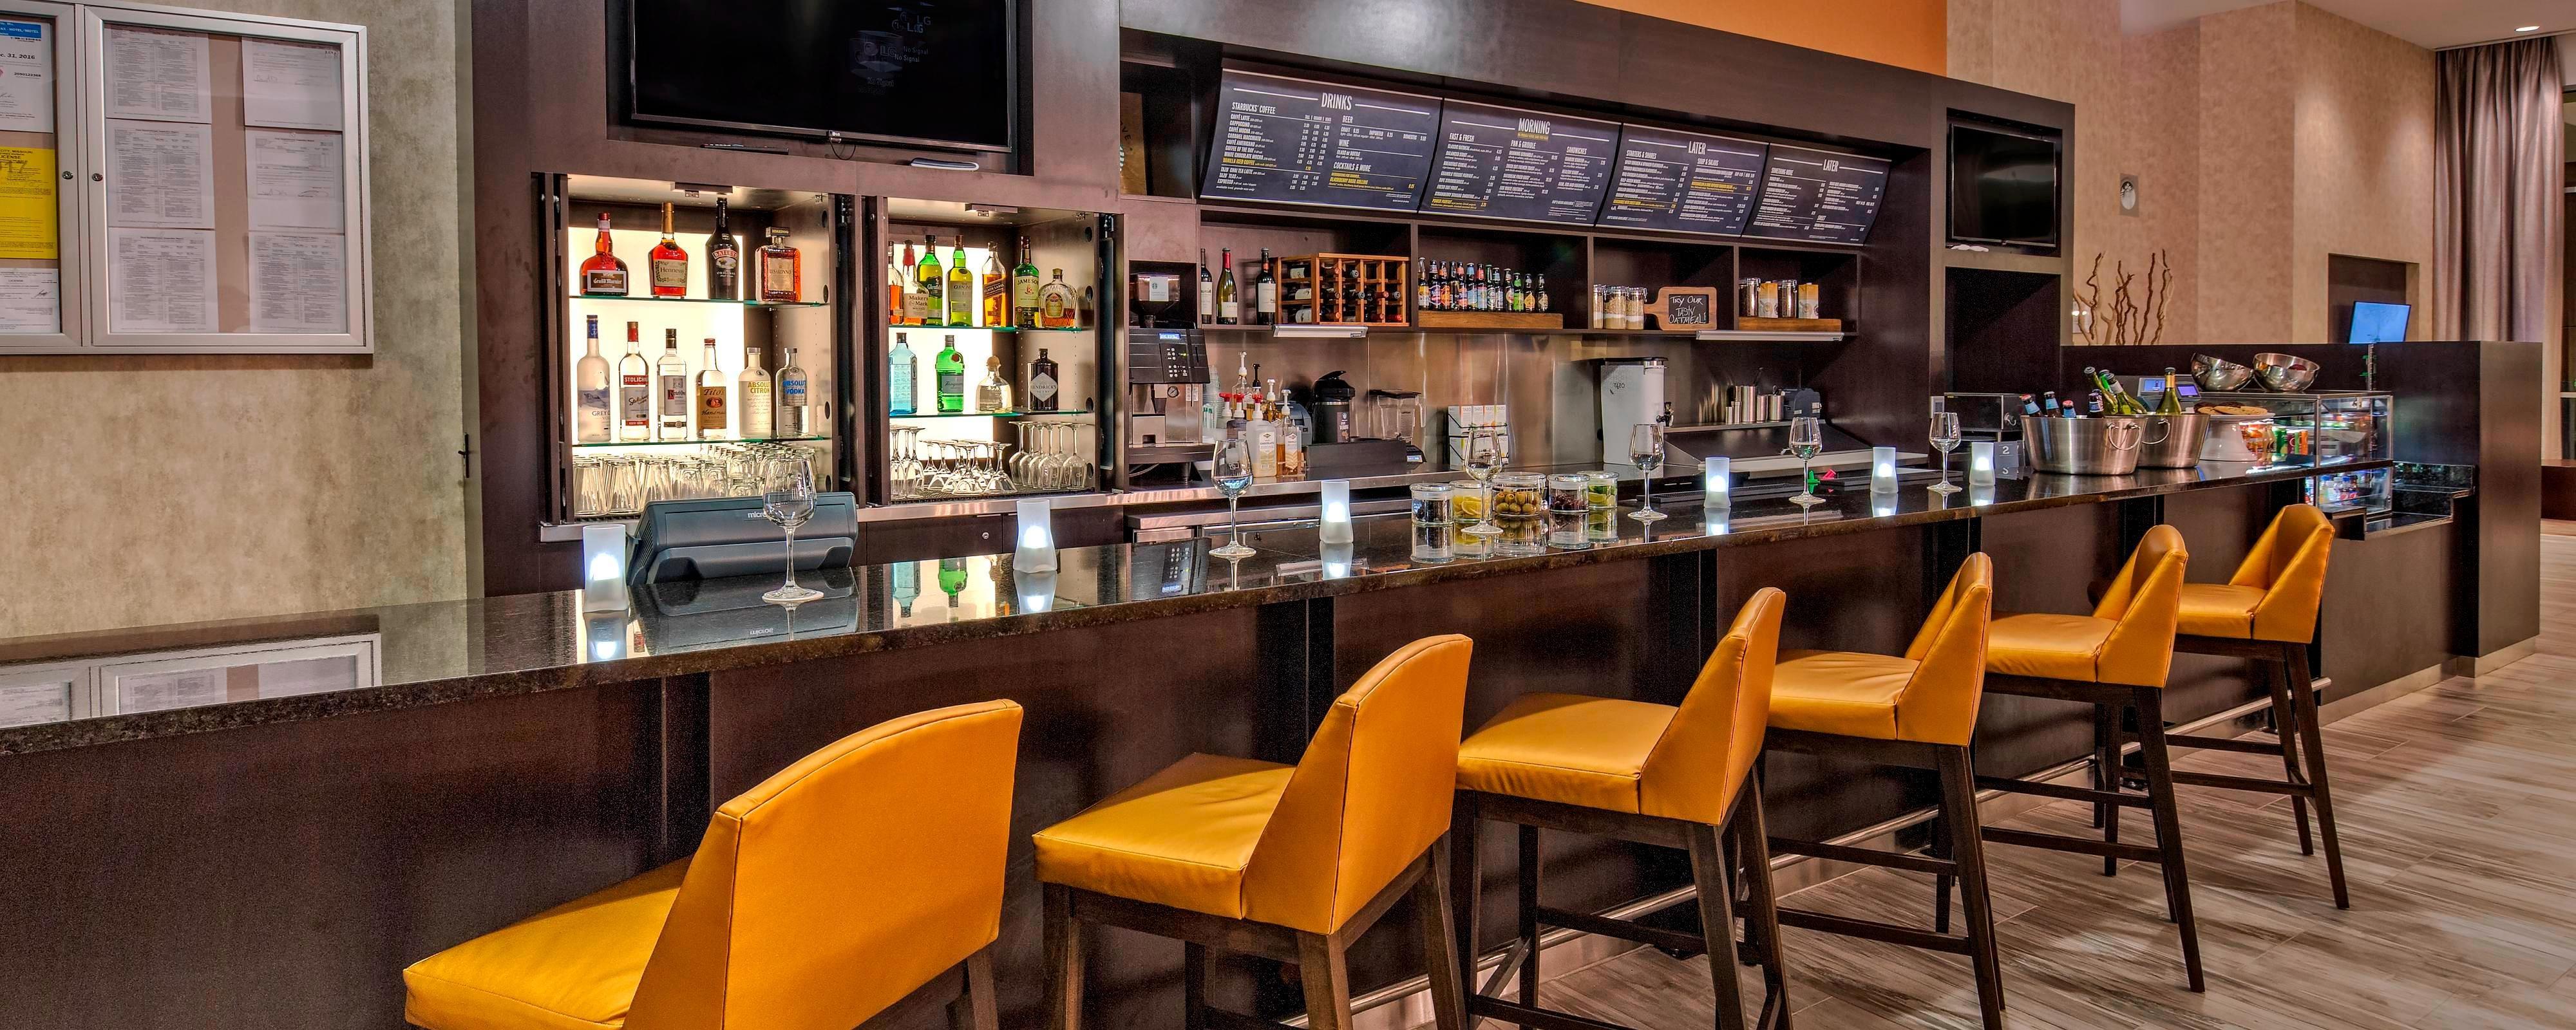 Restaurant Review Kansas City